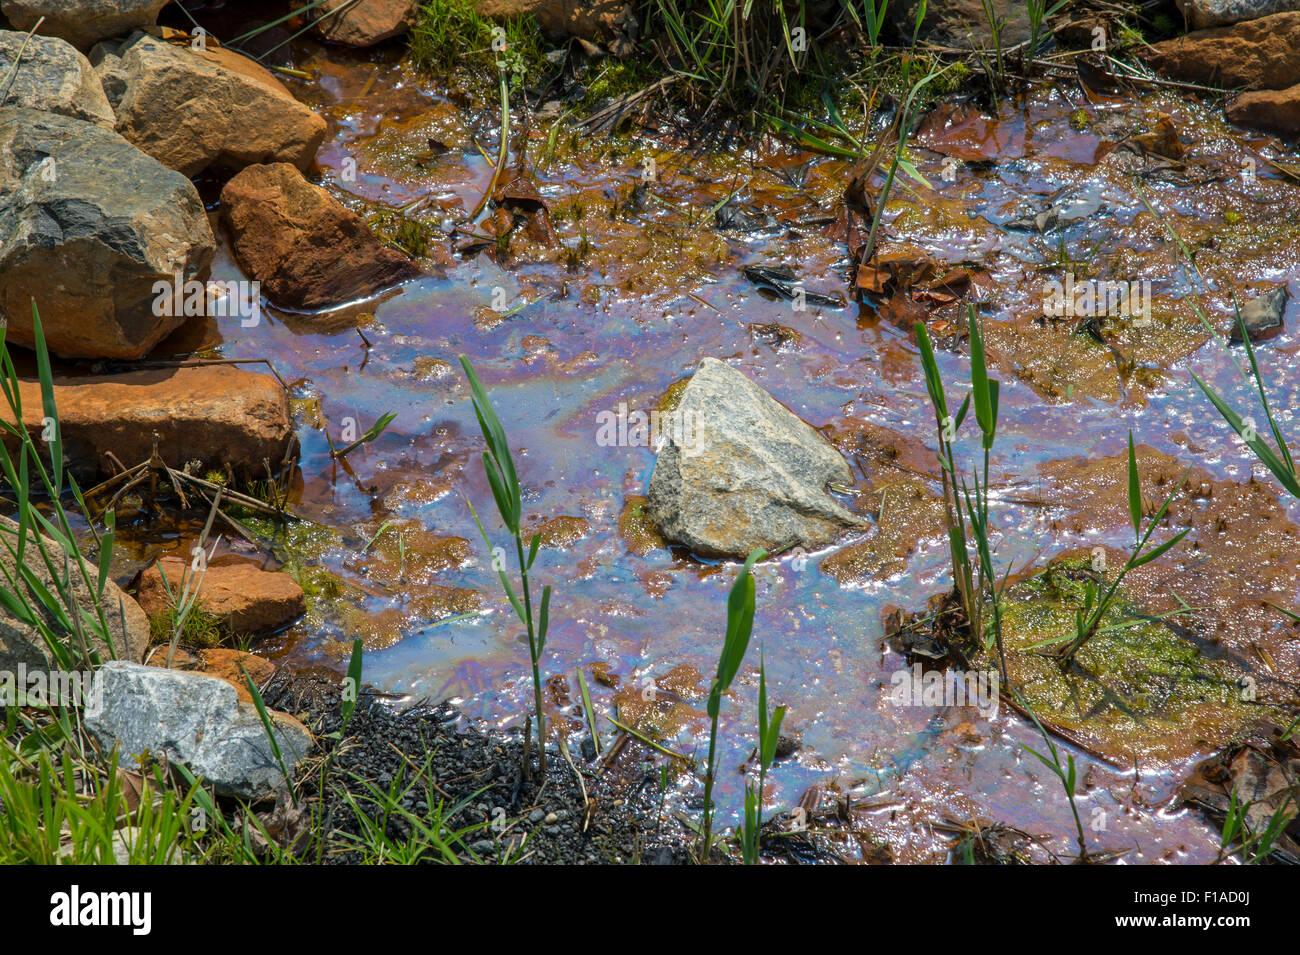 La pollution en cas de déversement d'hydrocarbures en stream Photo Stock